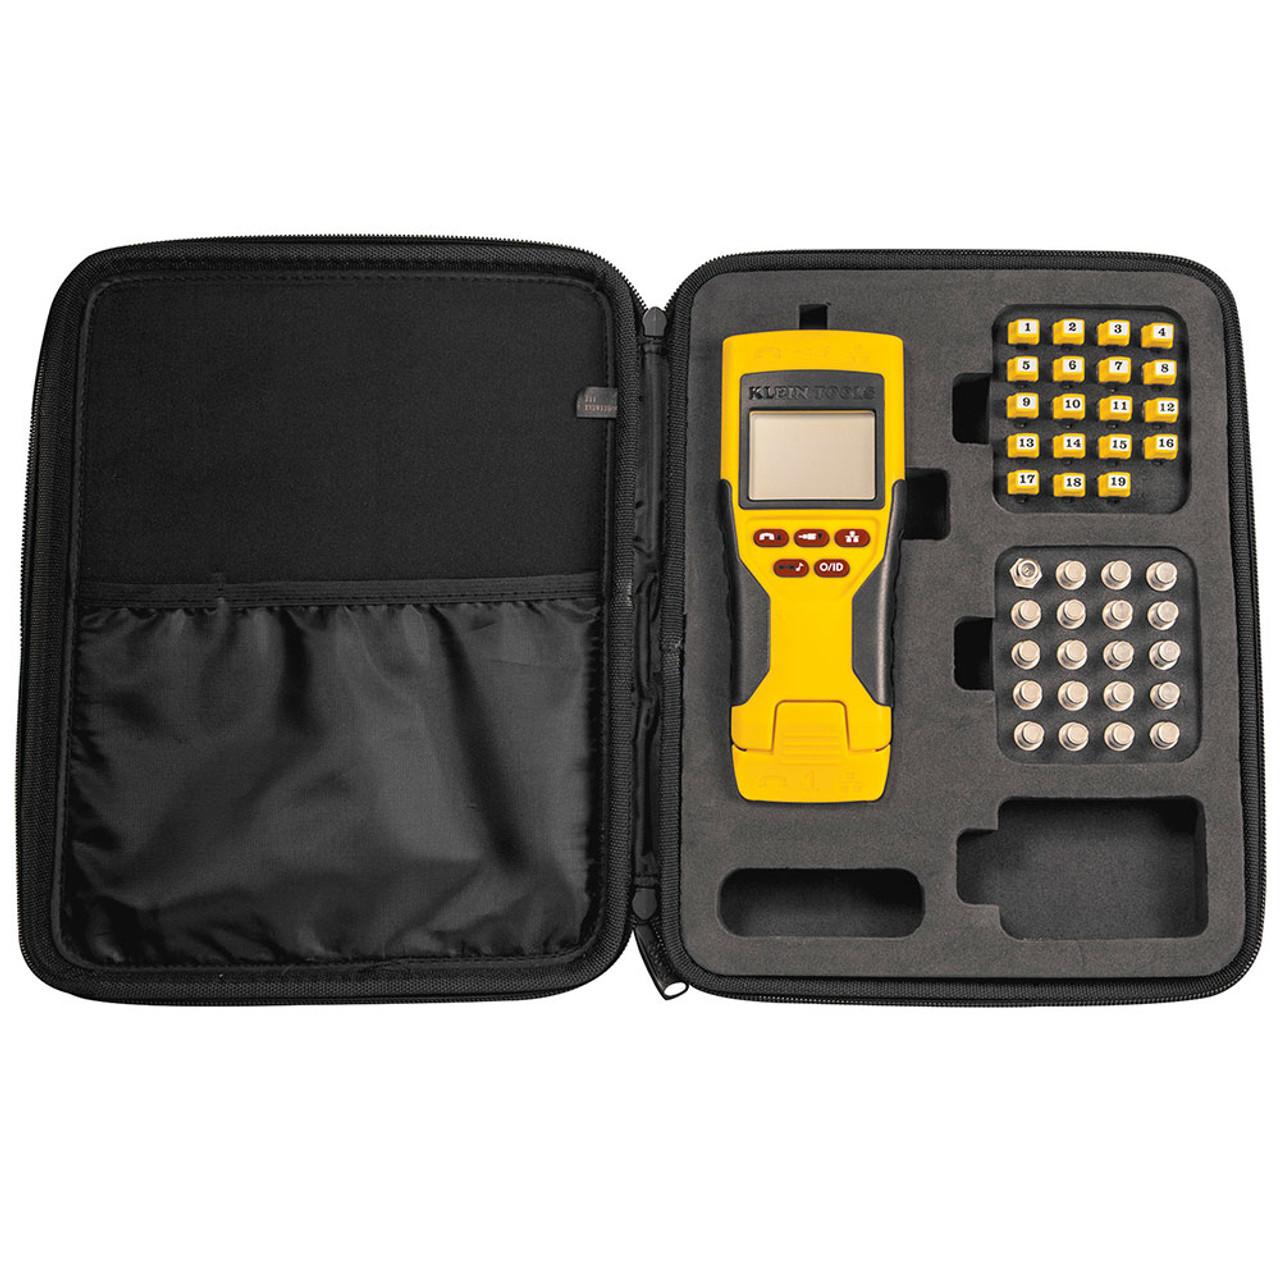 Klein VDV501-825 Scout Pro 2 LT Tester and Remote Kit